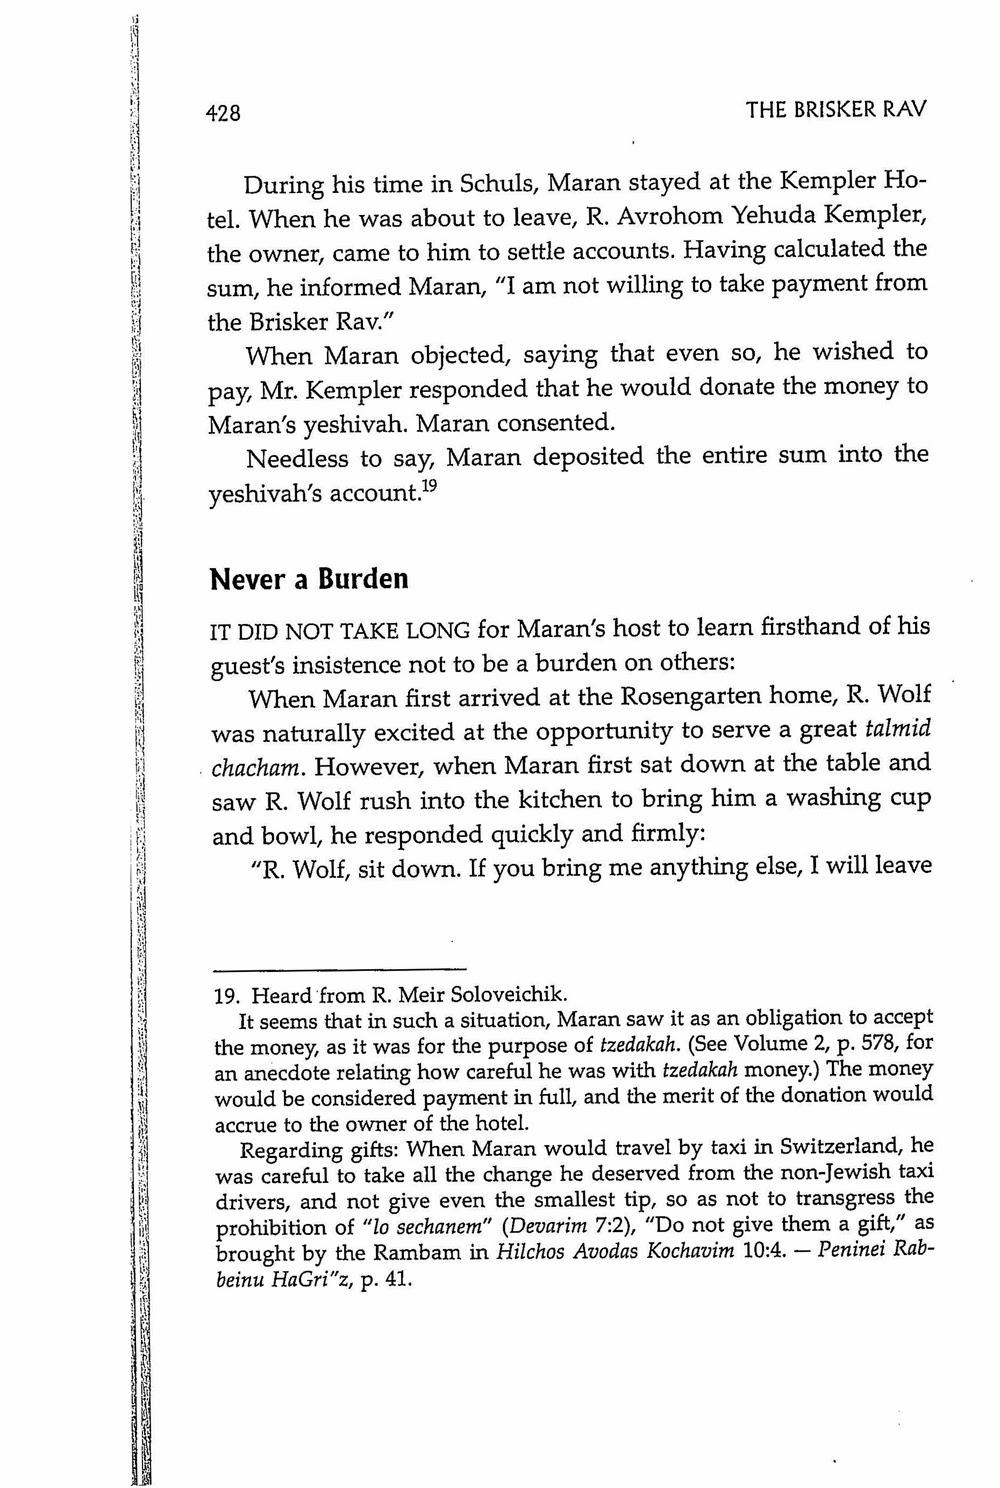 the seforim blog the vilna gaon part review of eliyahu stern  the seforim blog the vilna gaon part 3 review of eliyahu stern the genius by marc b shapiro